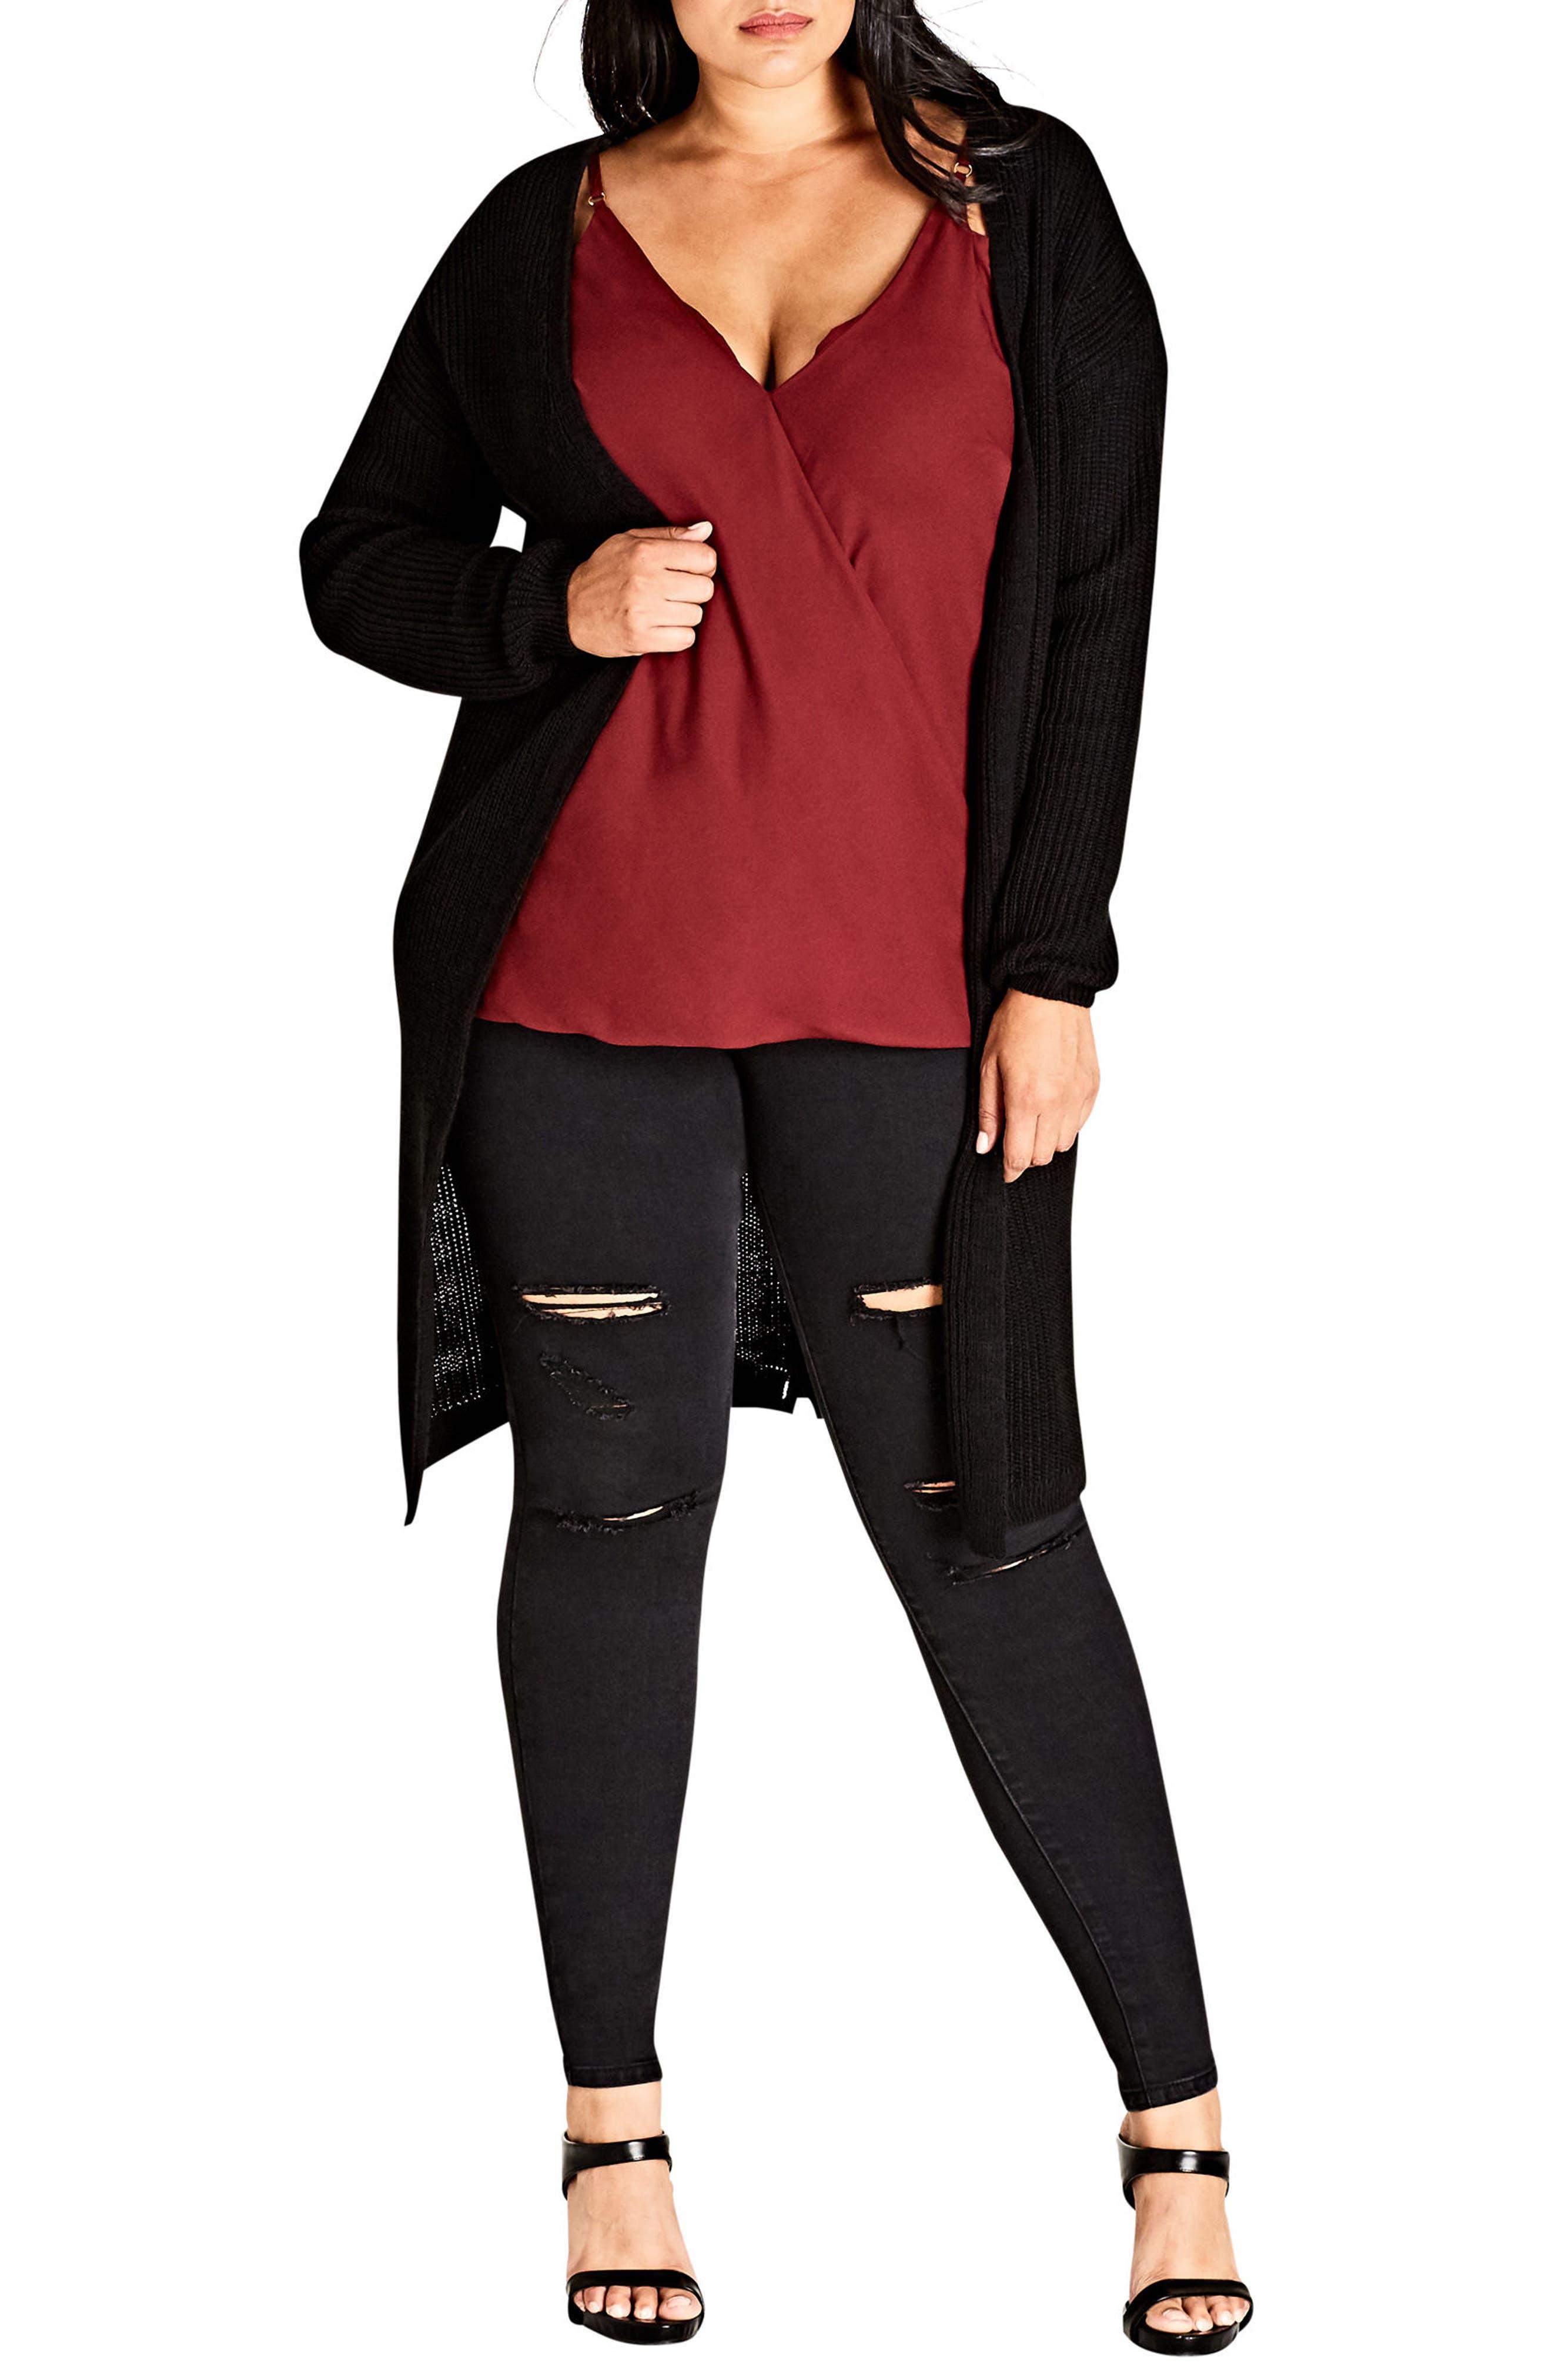 Alternate Image 1 Selected - City Chic Braid Back Cardigan (Plus Size)